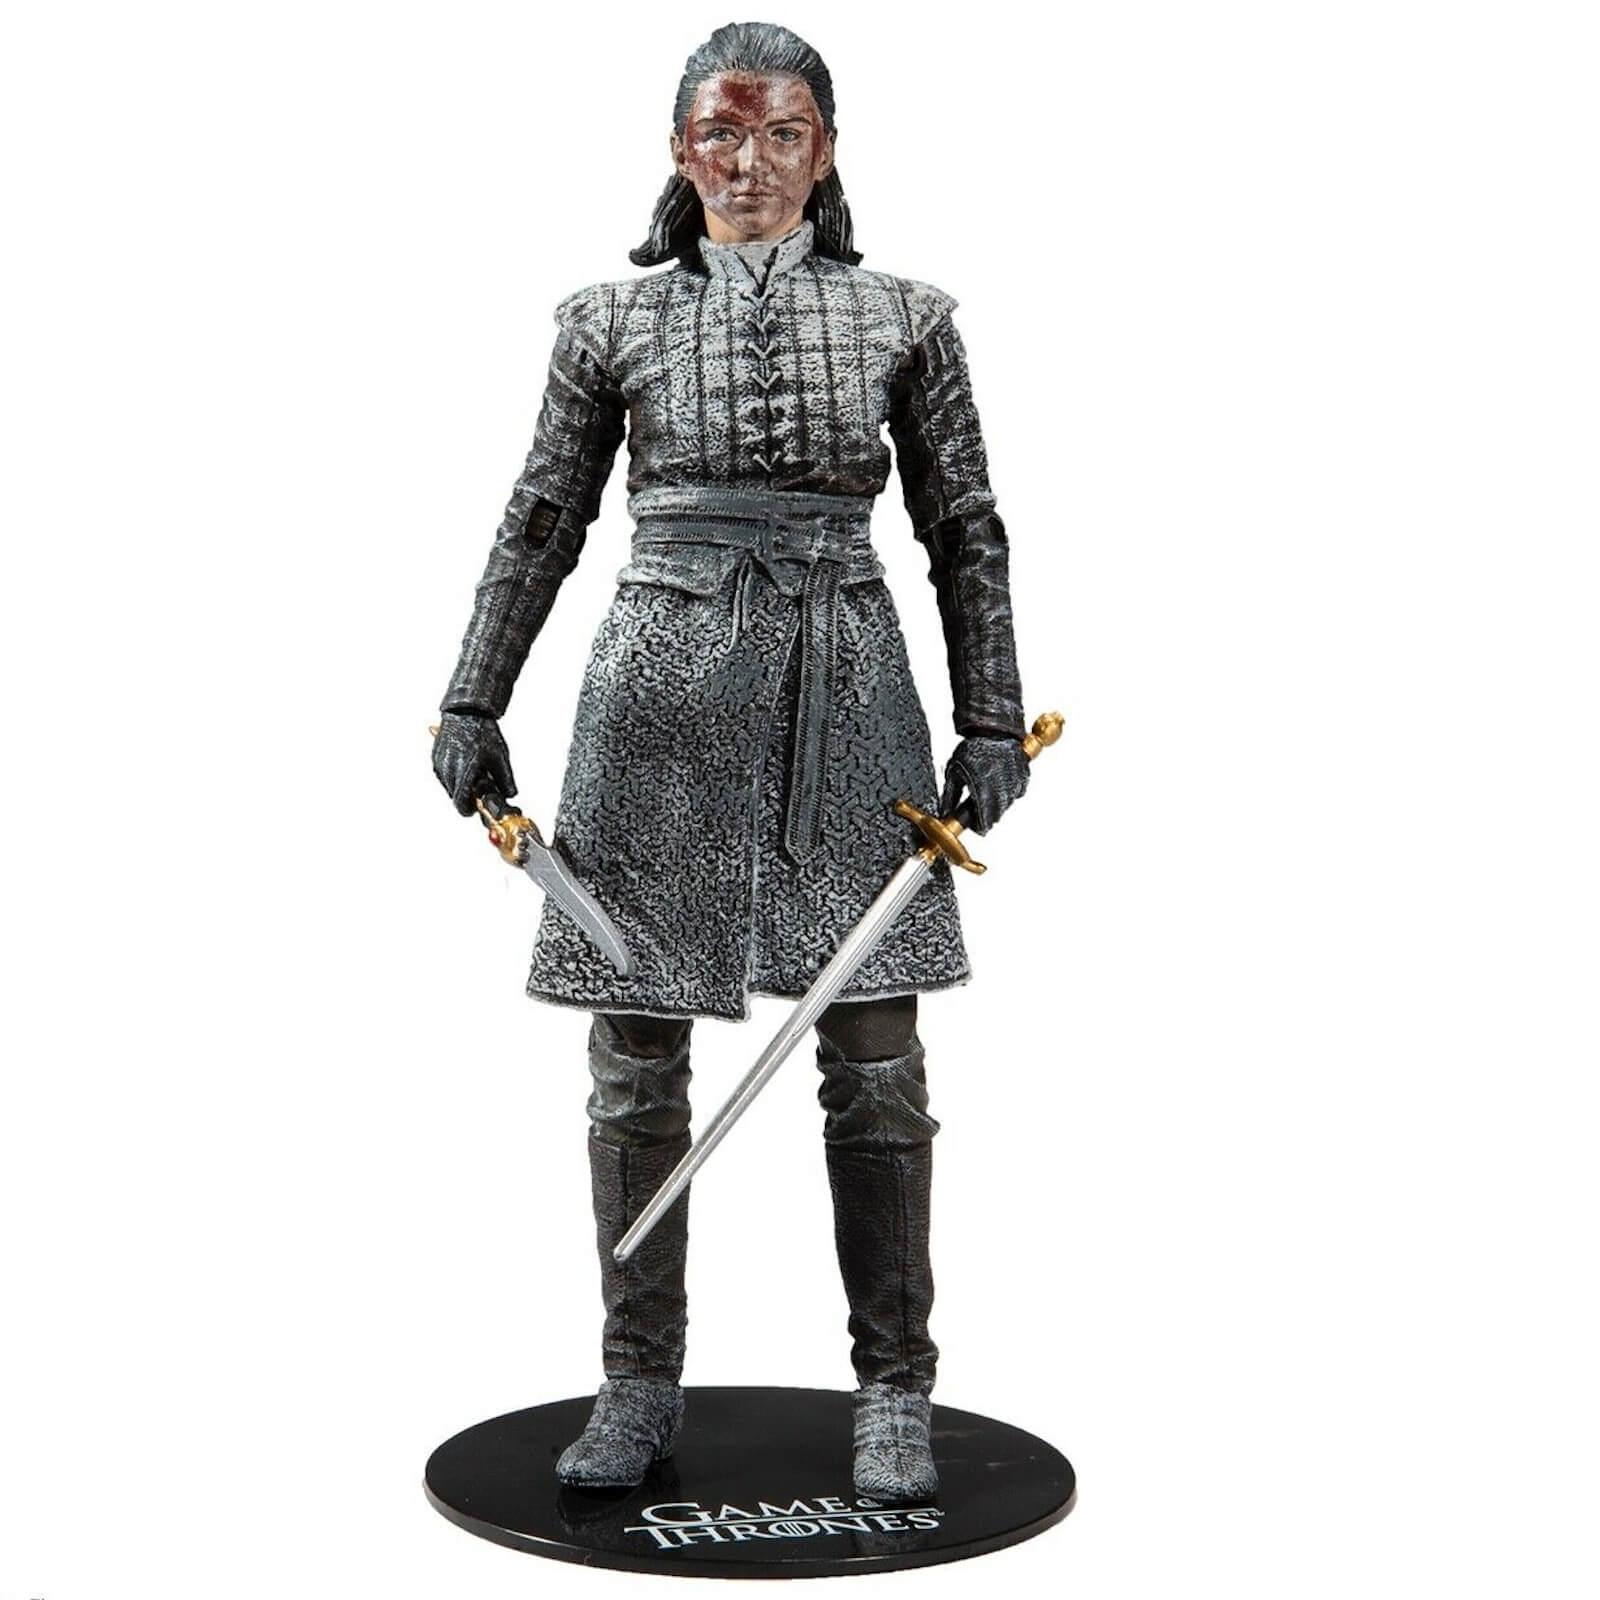 McFarlane Toys McFarlane Game of Thrones Action Figure Arya Stark - King's Landing Ver. 15 cm